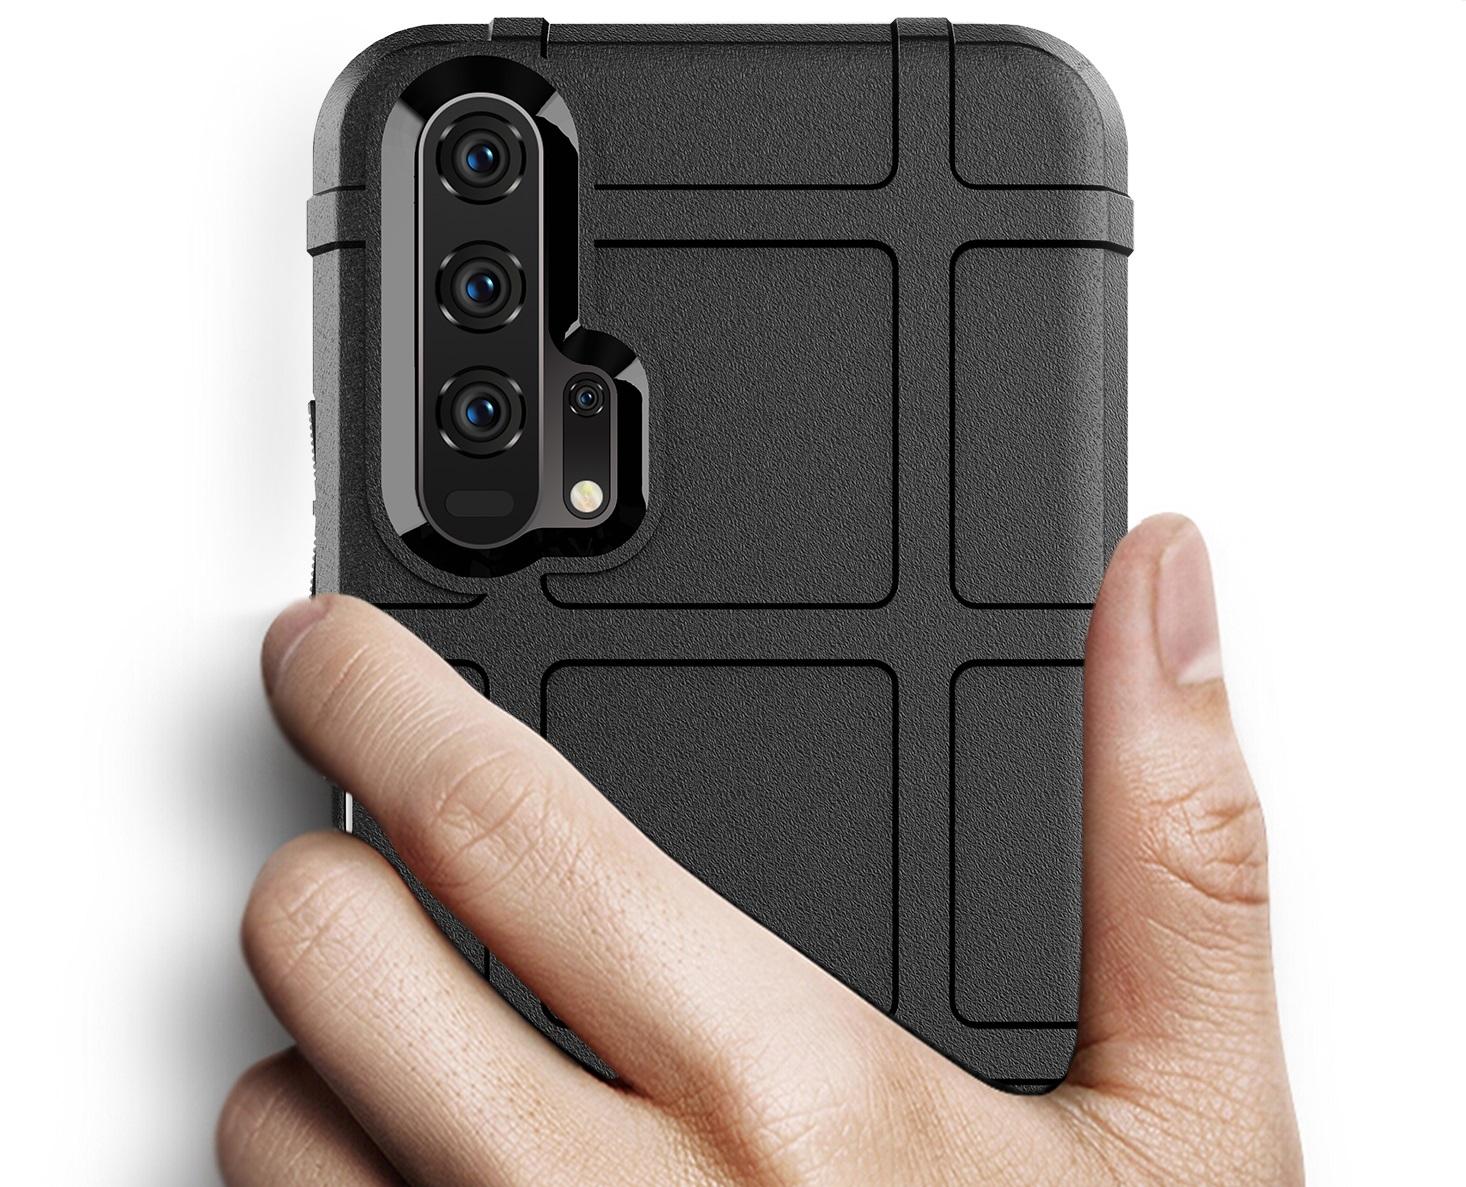 Чехол для Honor 20 (Honor 20S, 20 Pro, Huawei Nova 5T) цвет Black (черный), серия Armor от Caseport